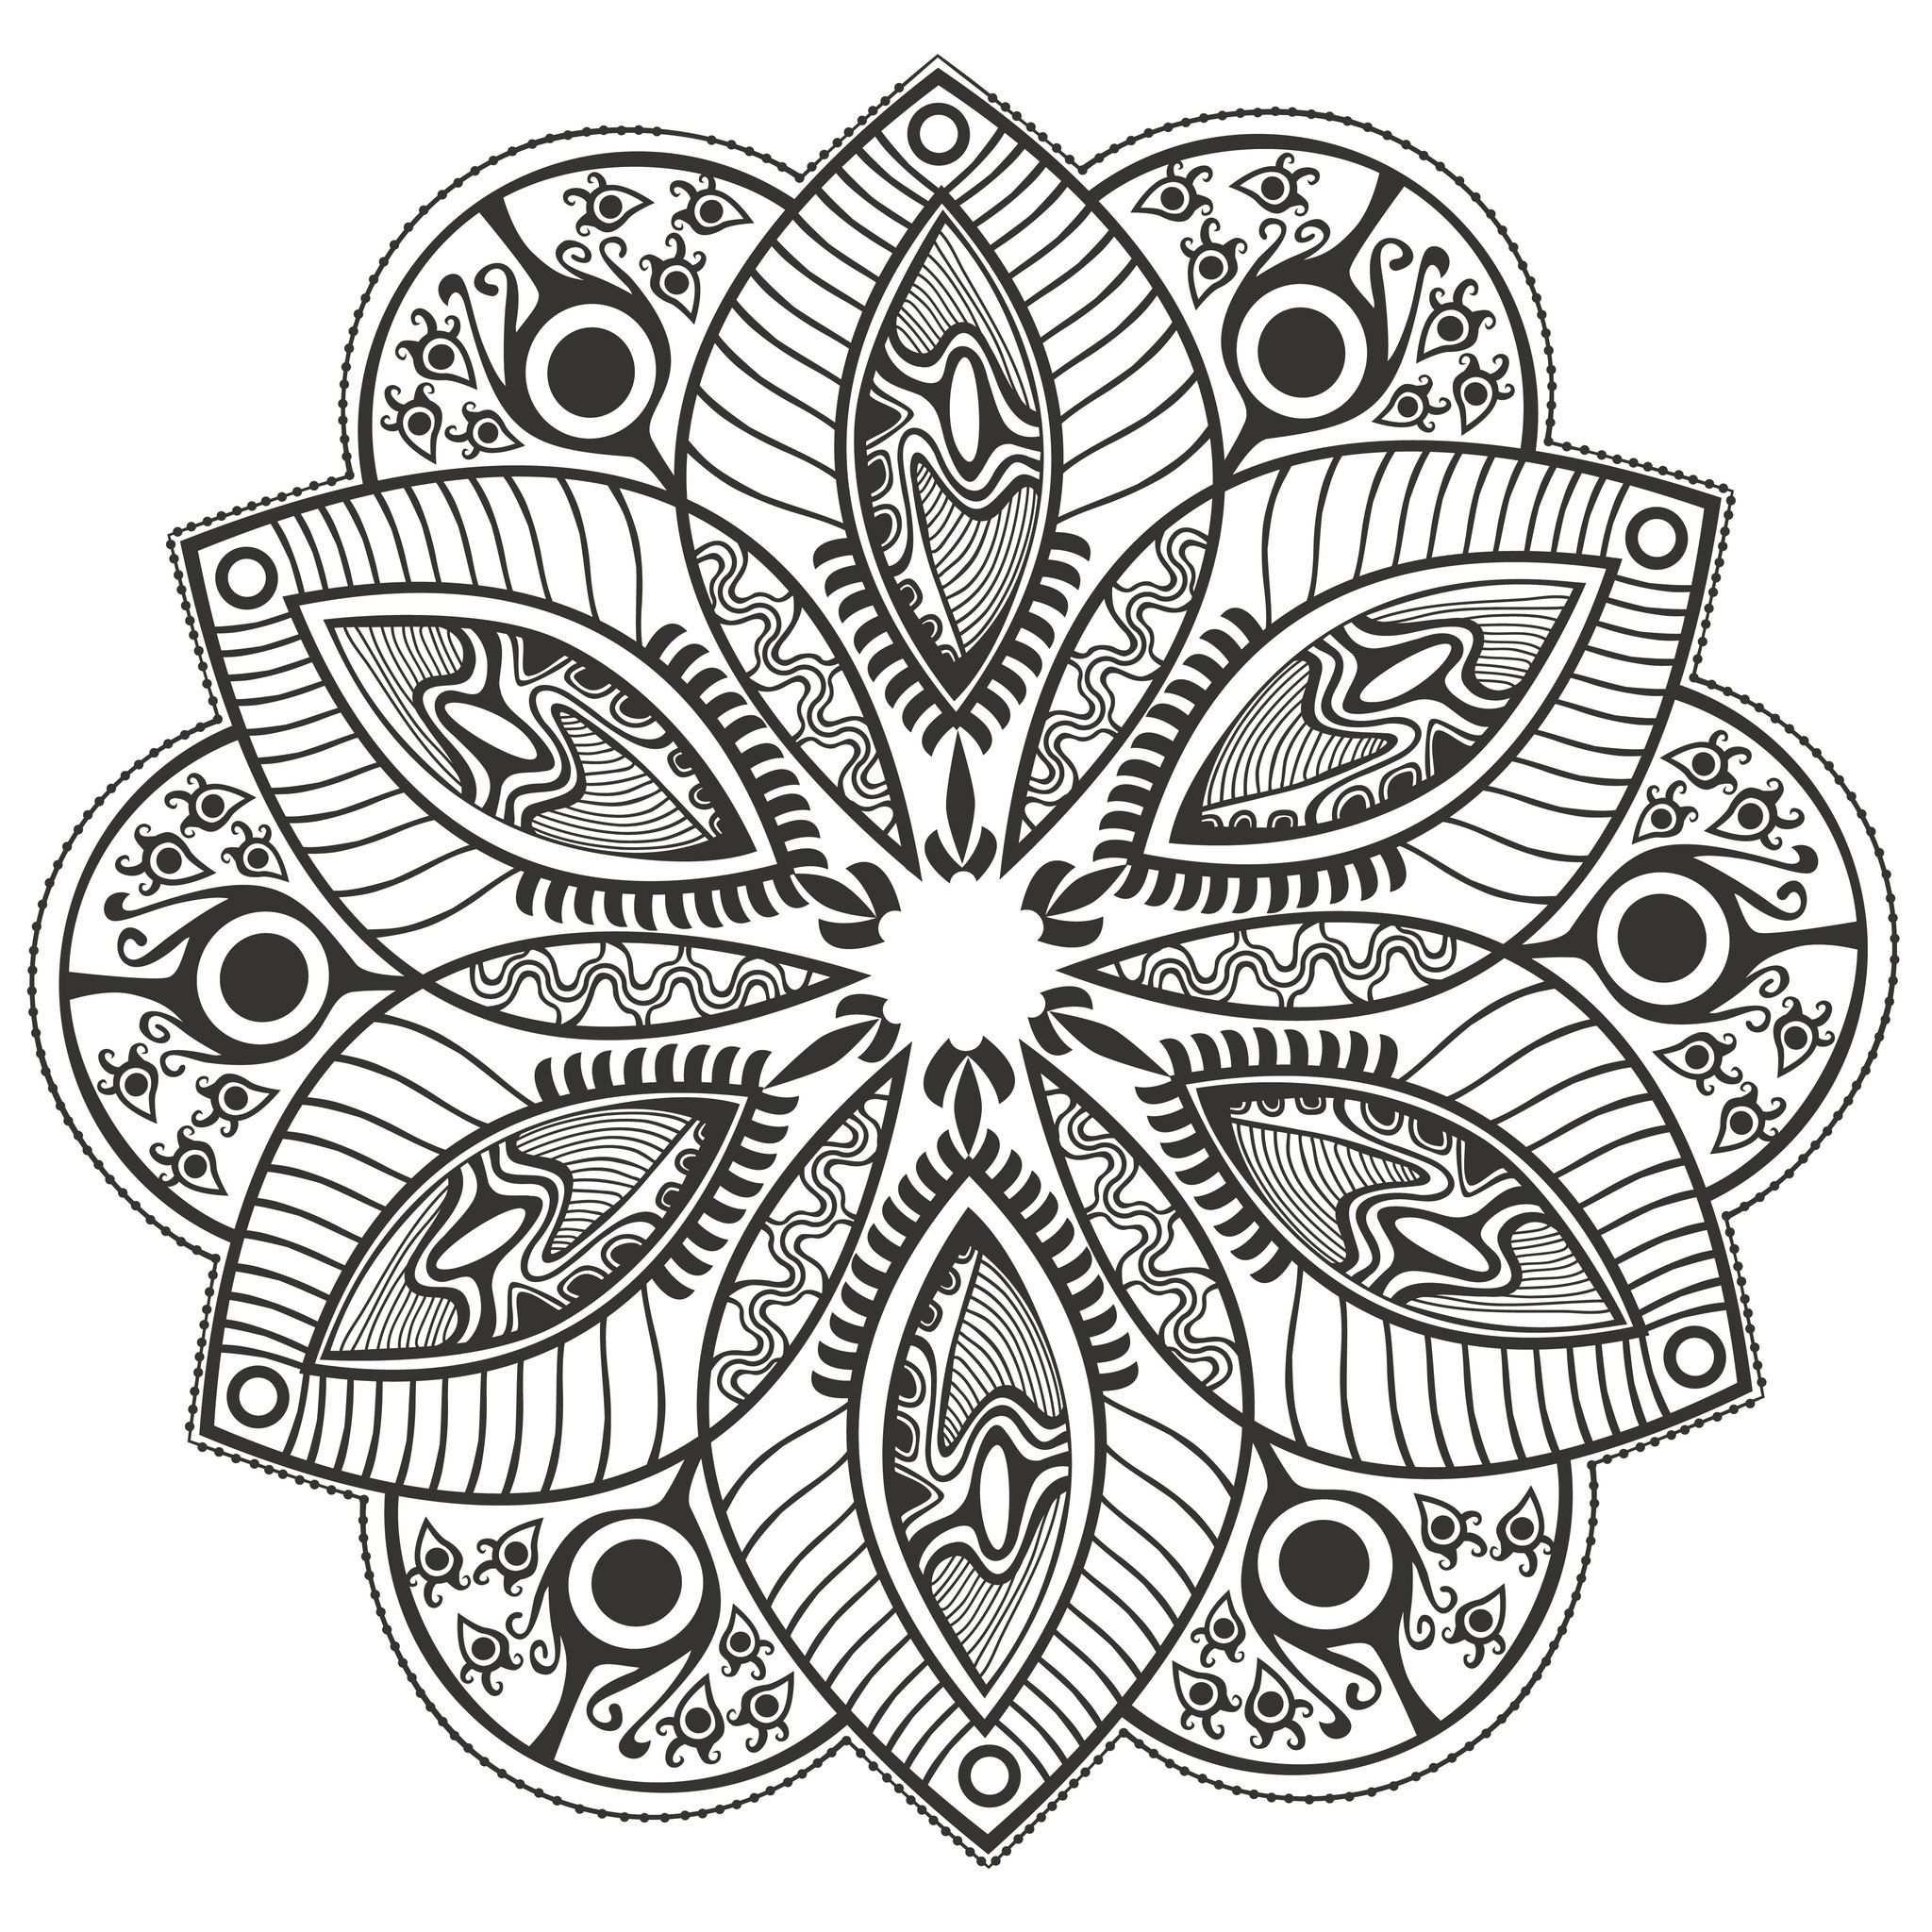 Mandala Original Flower Mandalas Coloring Pages For Adults